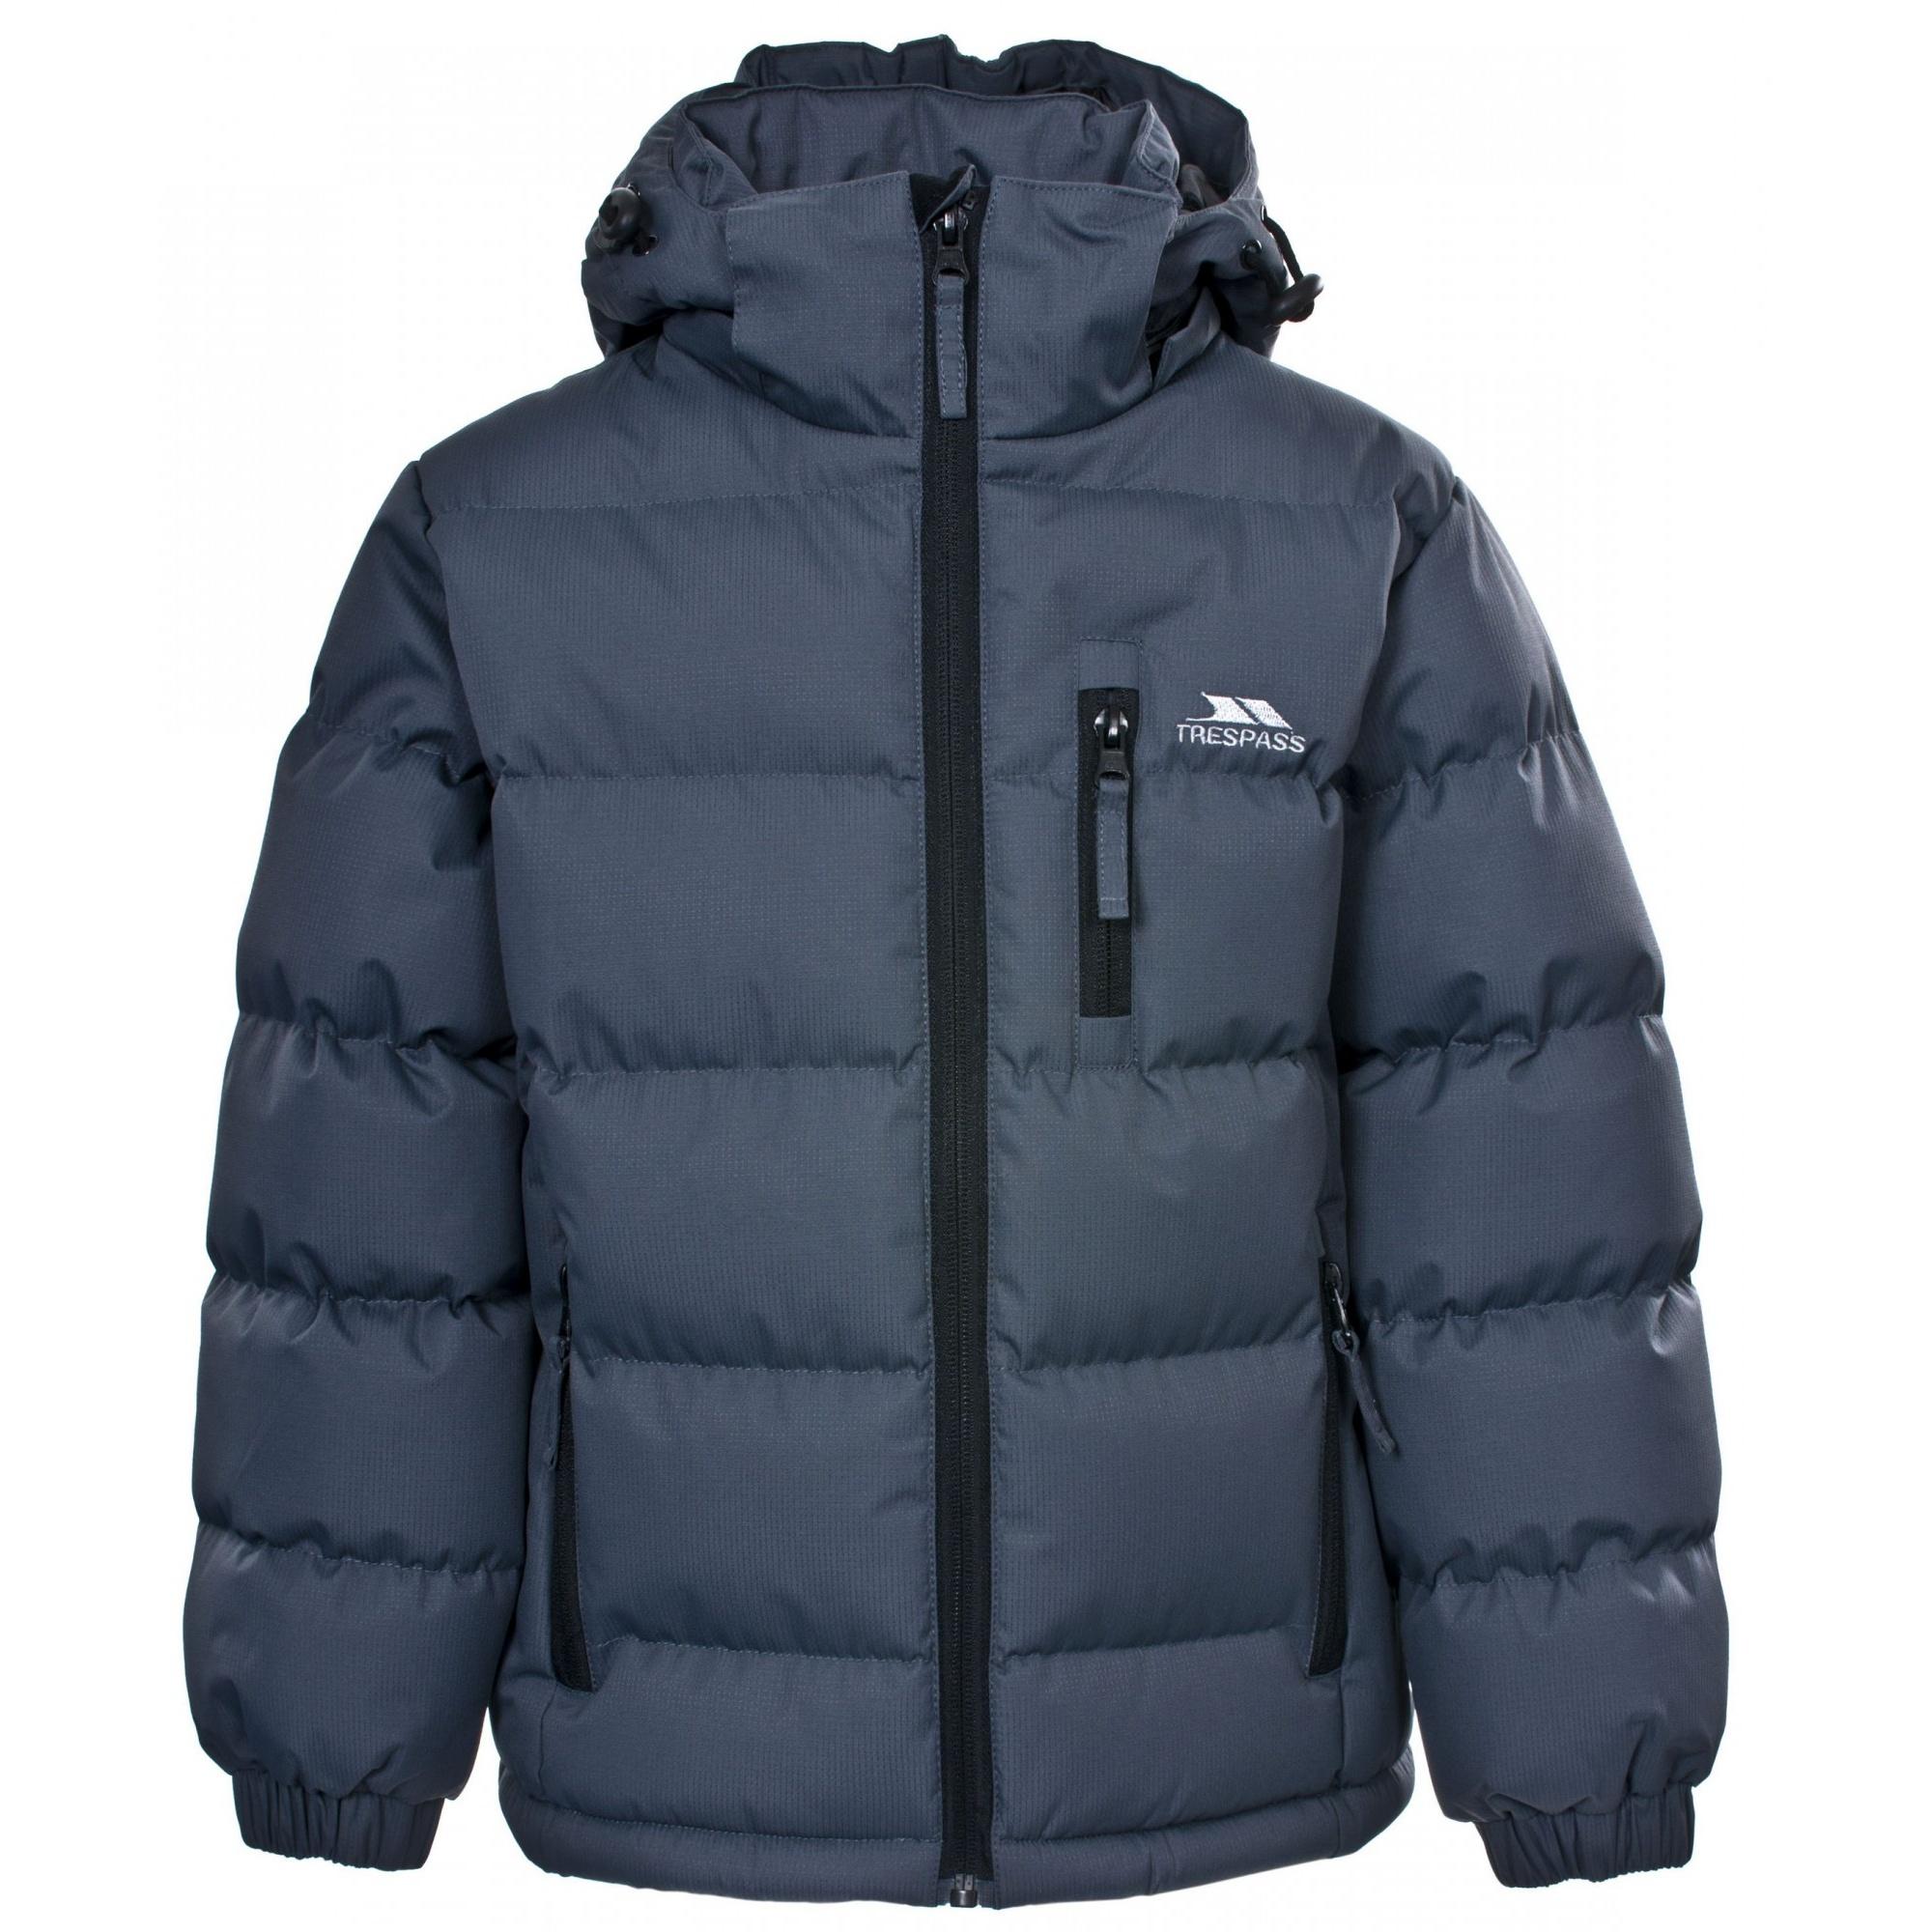 Trespass-Childrens-Kids-Tuff-Padded-Jacket-PC2372